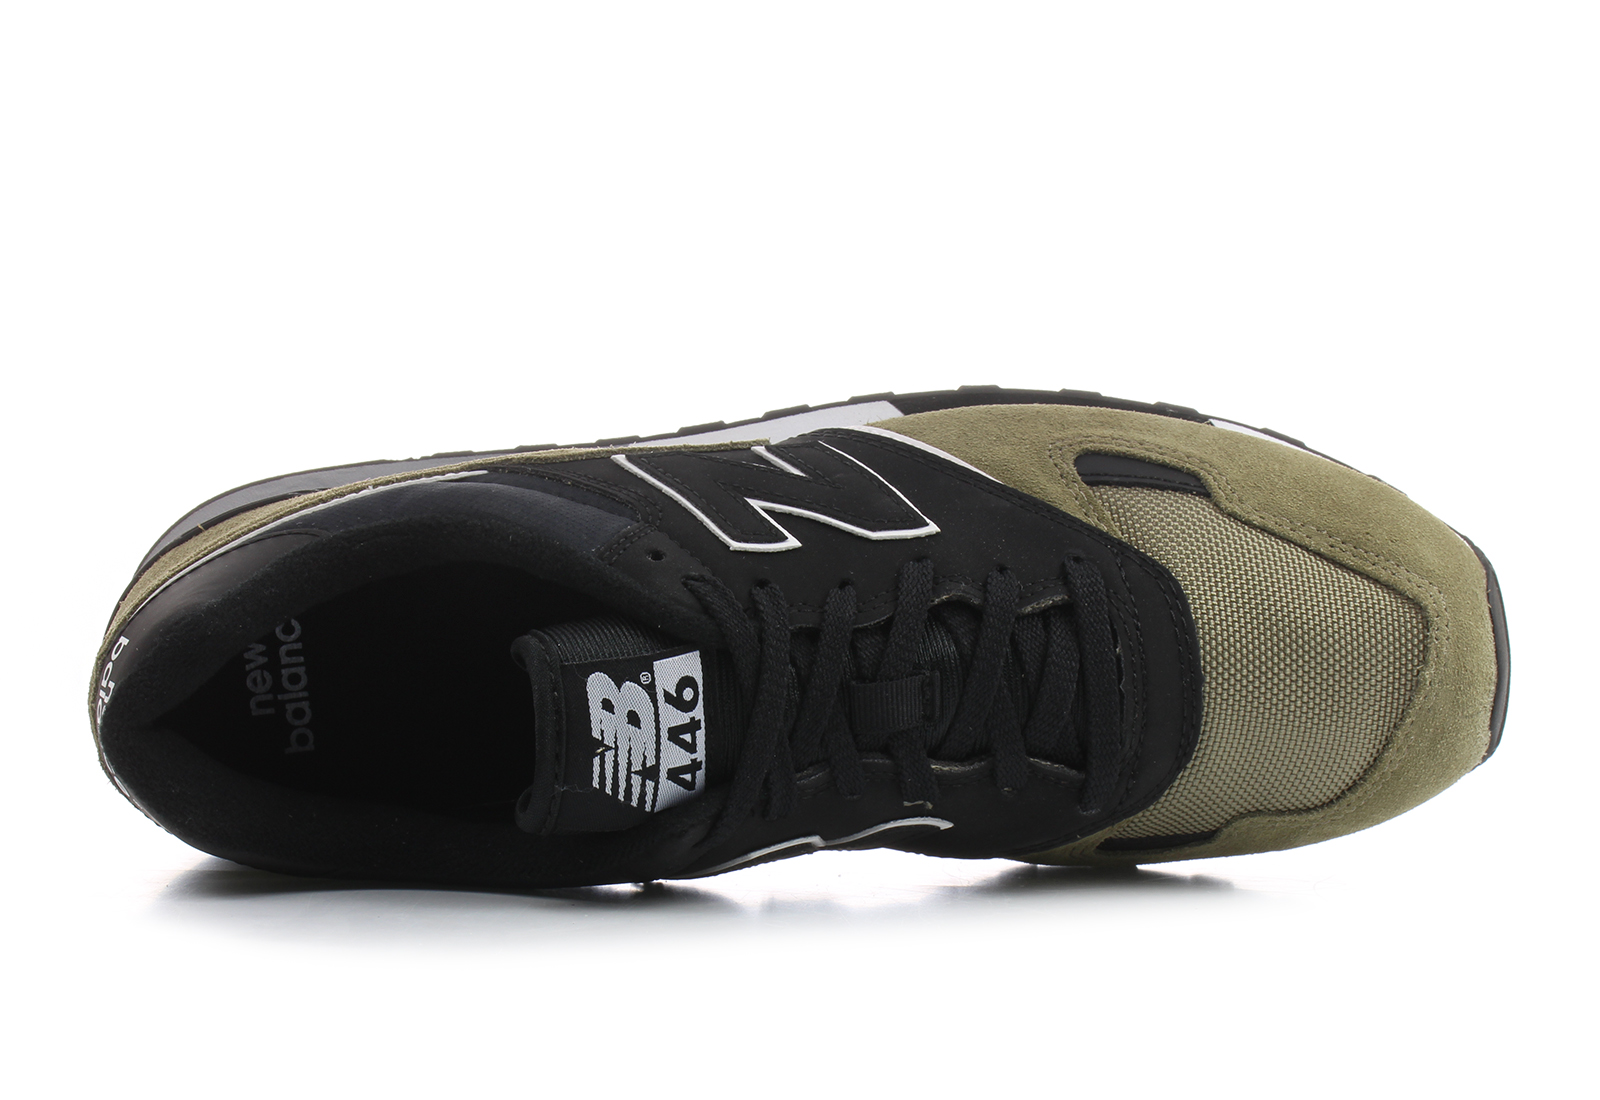 New Balance Topánky - U446 - U446GKW - Tenisky 6cf224e1616